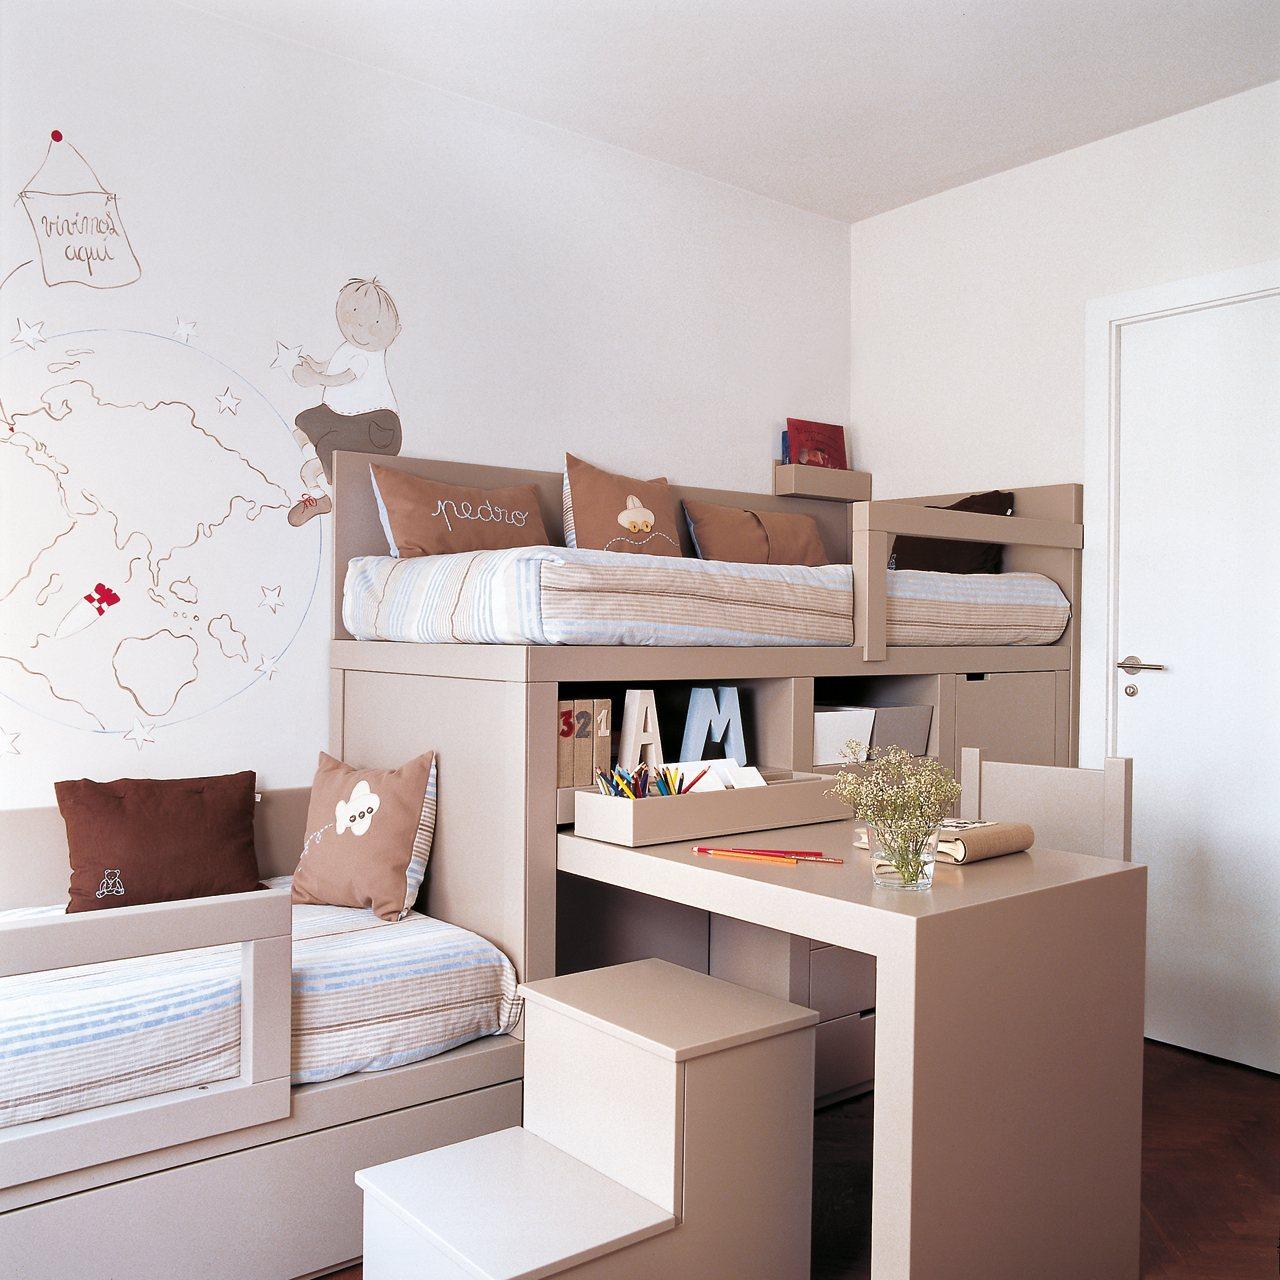 Dormitorios infantiles peque os s cales partido - Literas para ninos pequenos ...